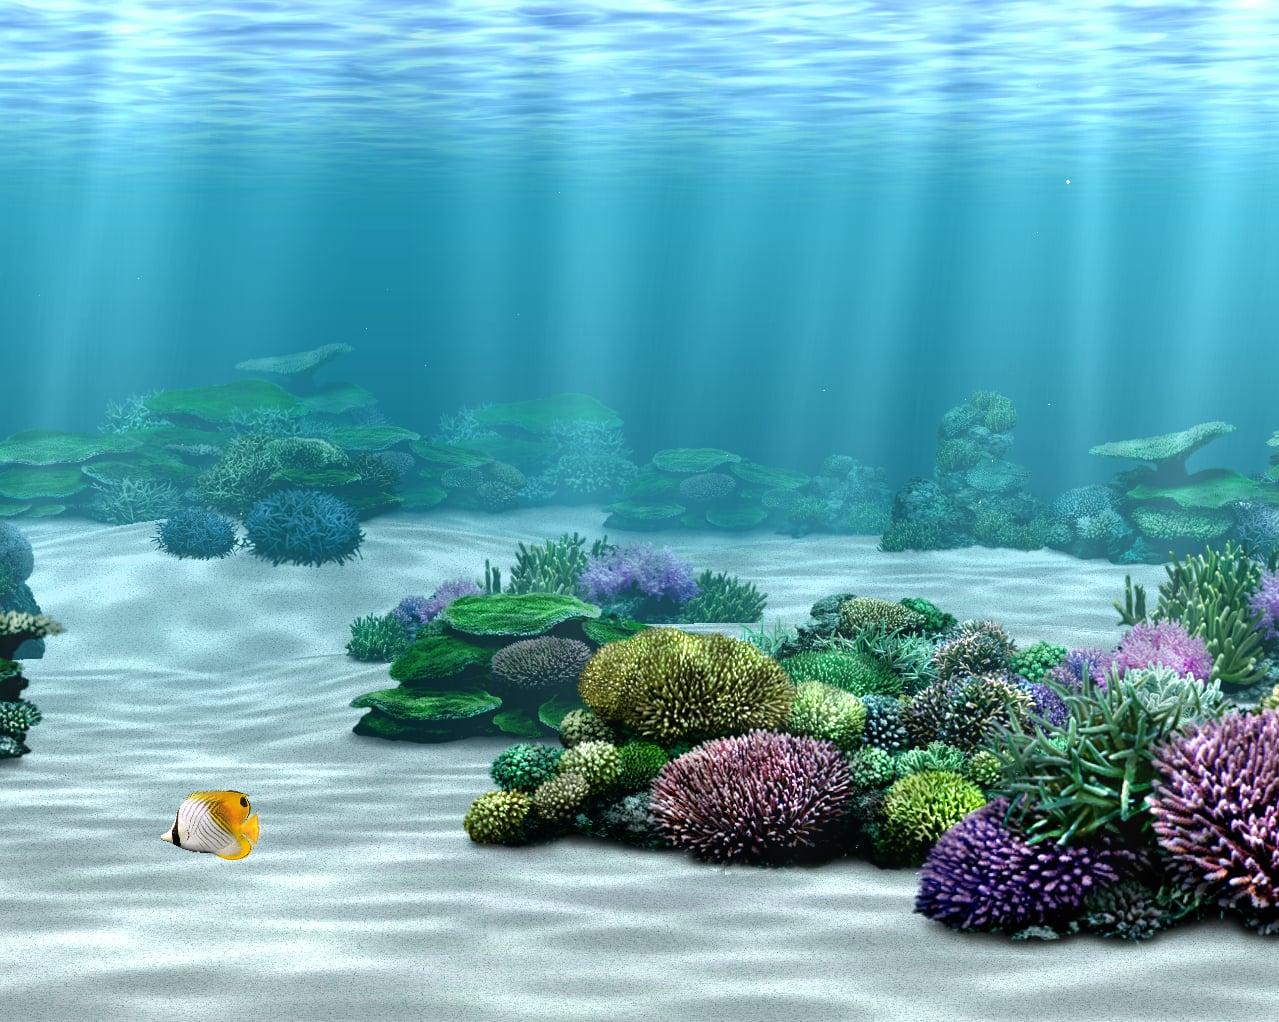 Aquazone 2 - Oceans of the World